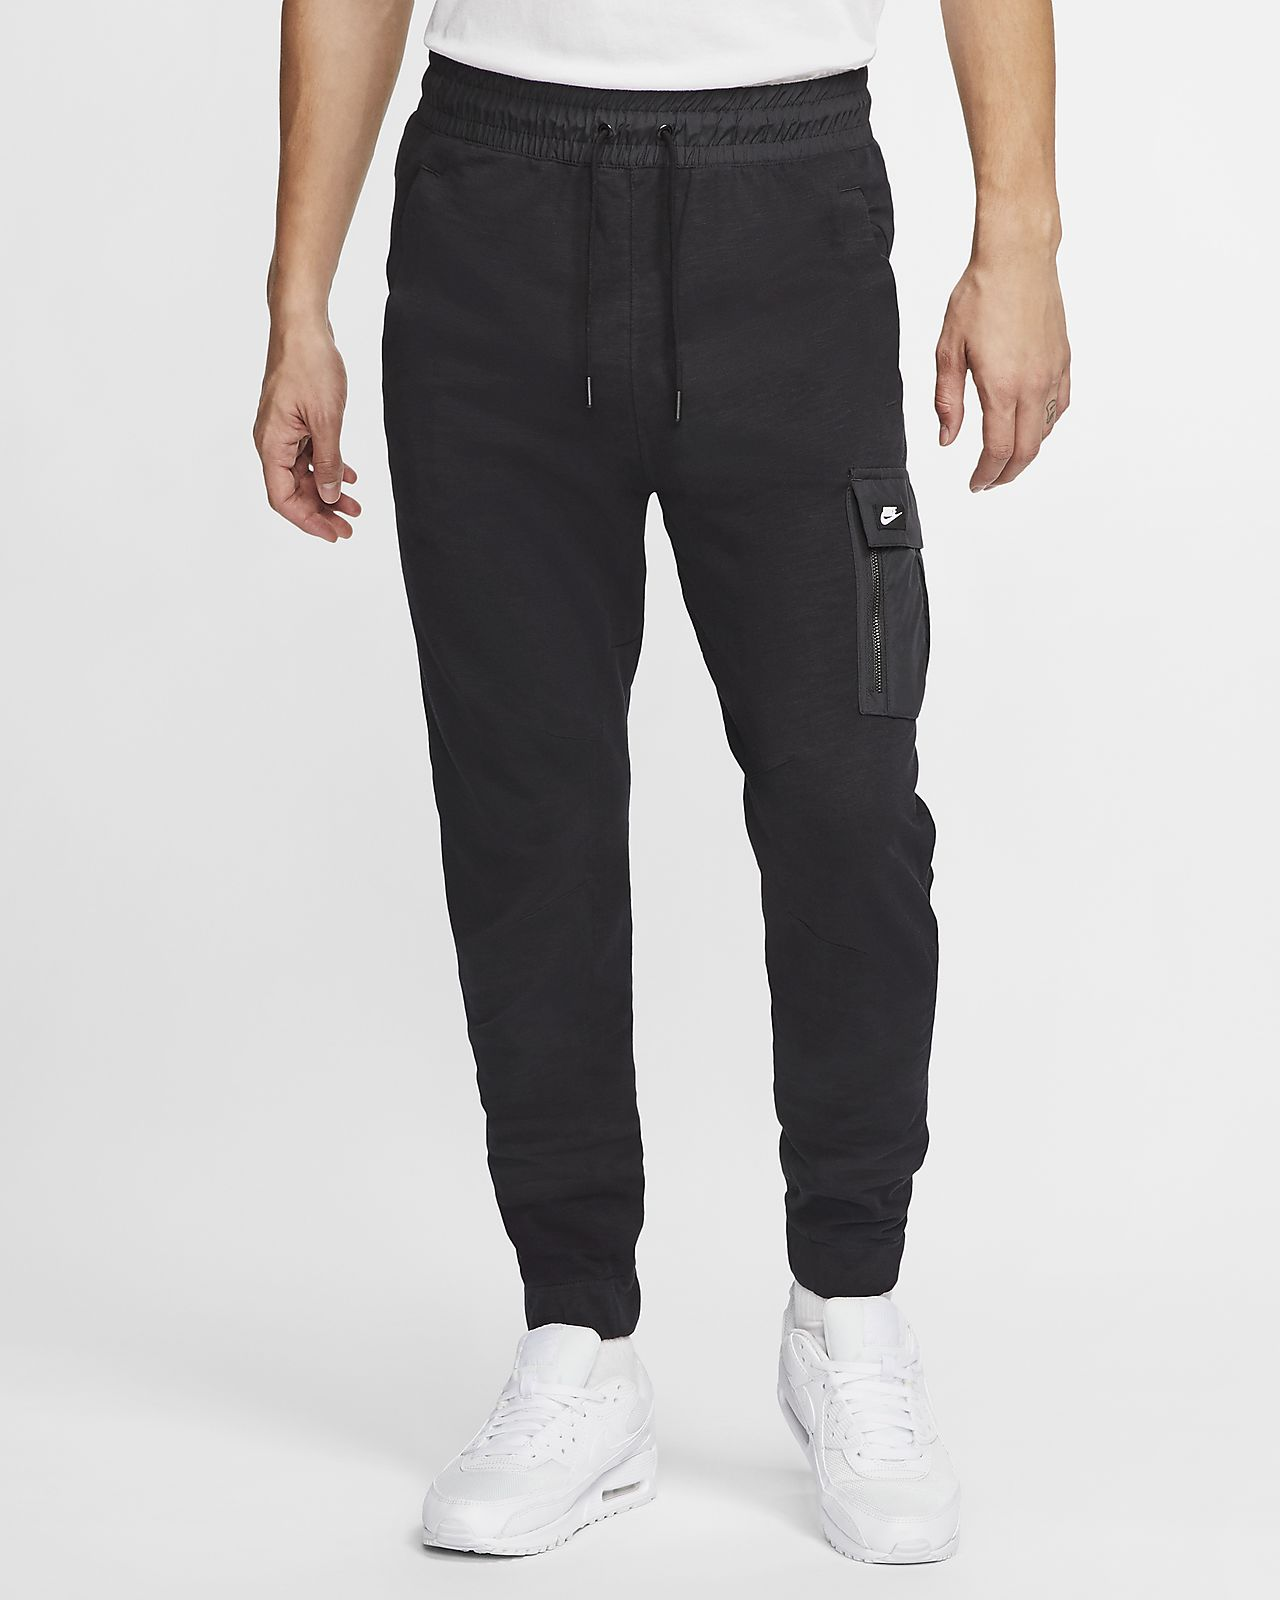 pantaloni nike bottoni laterali